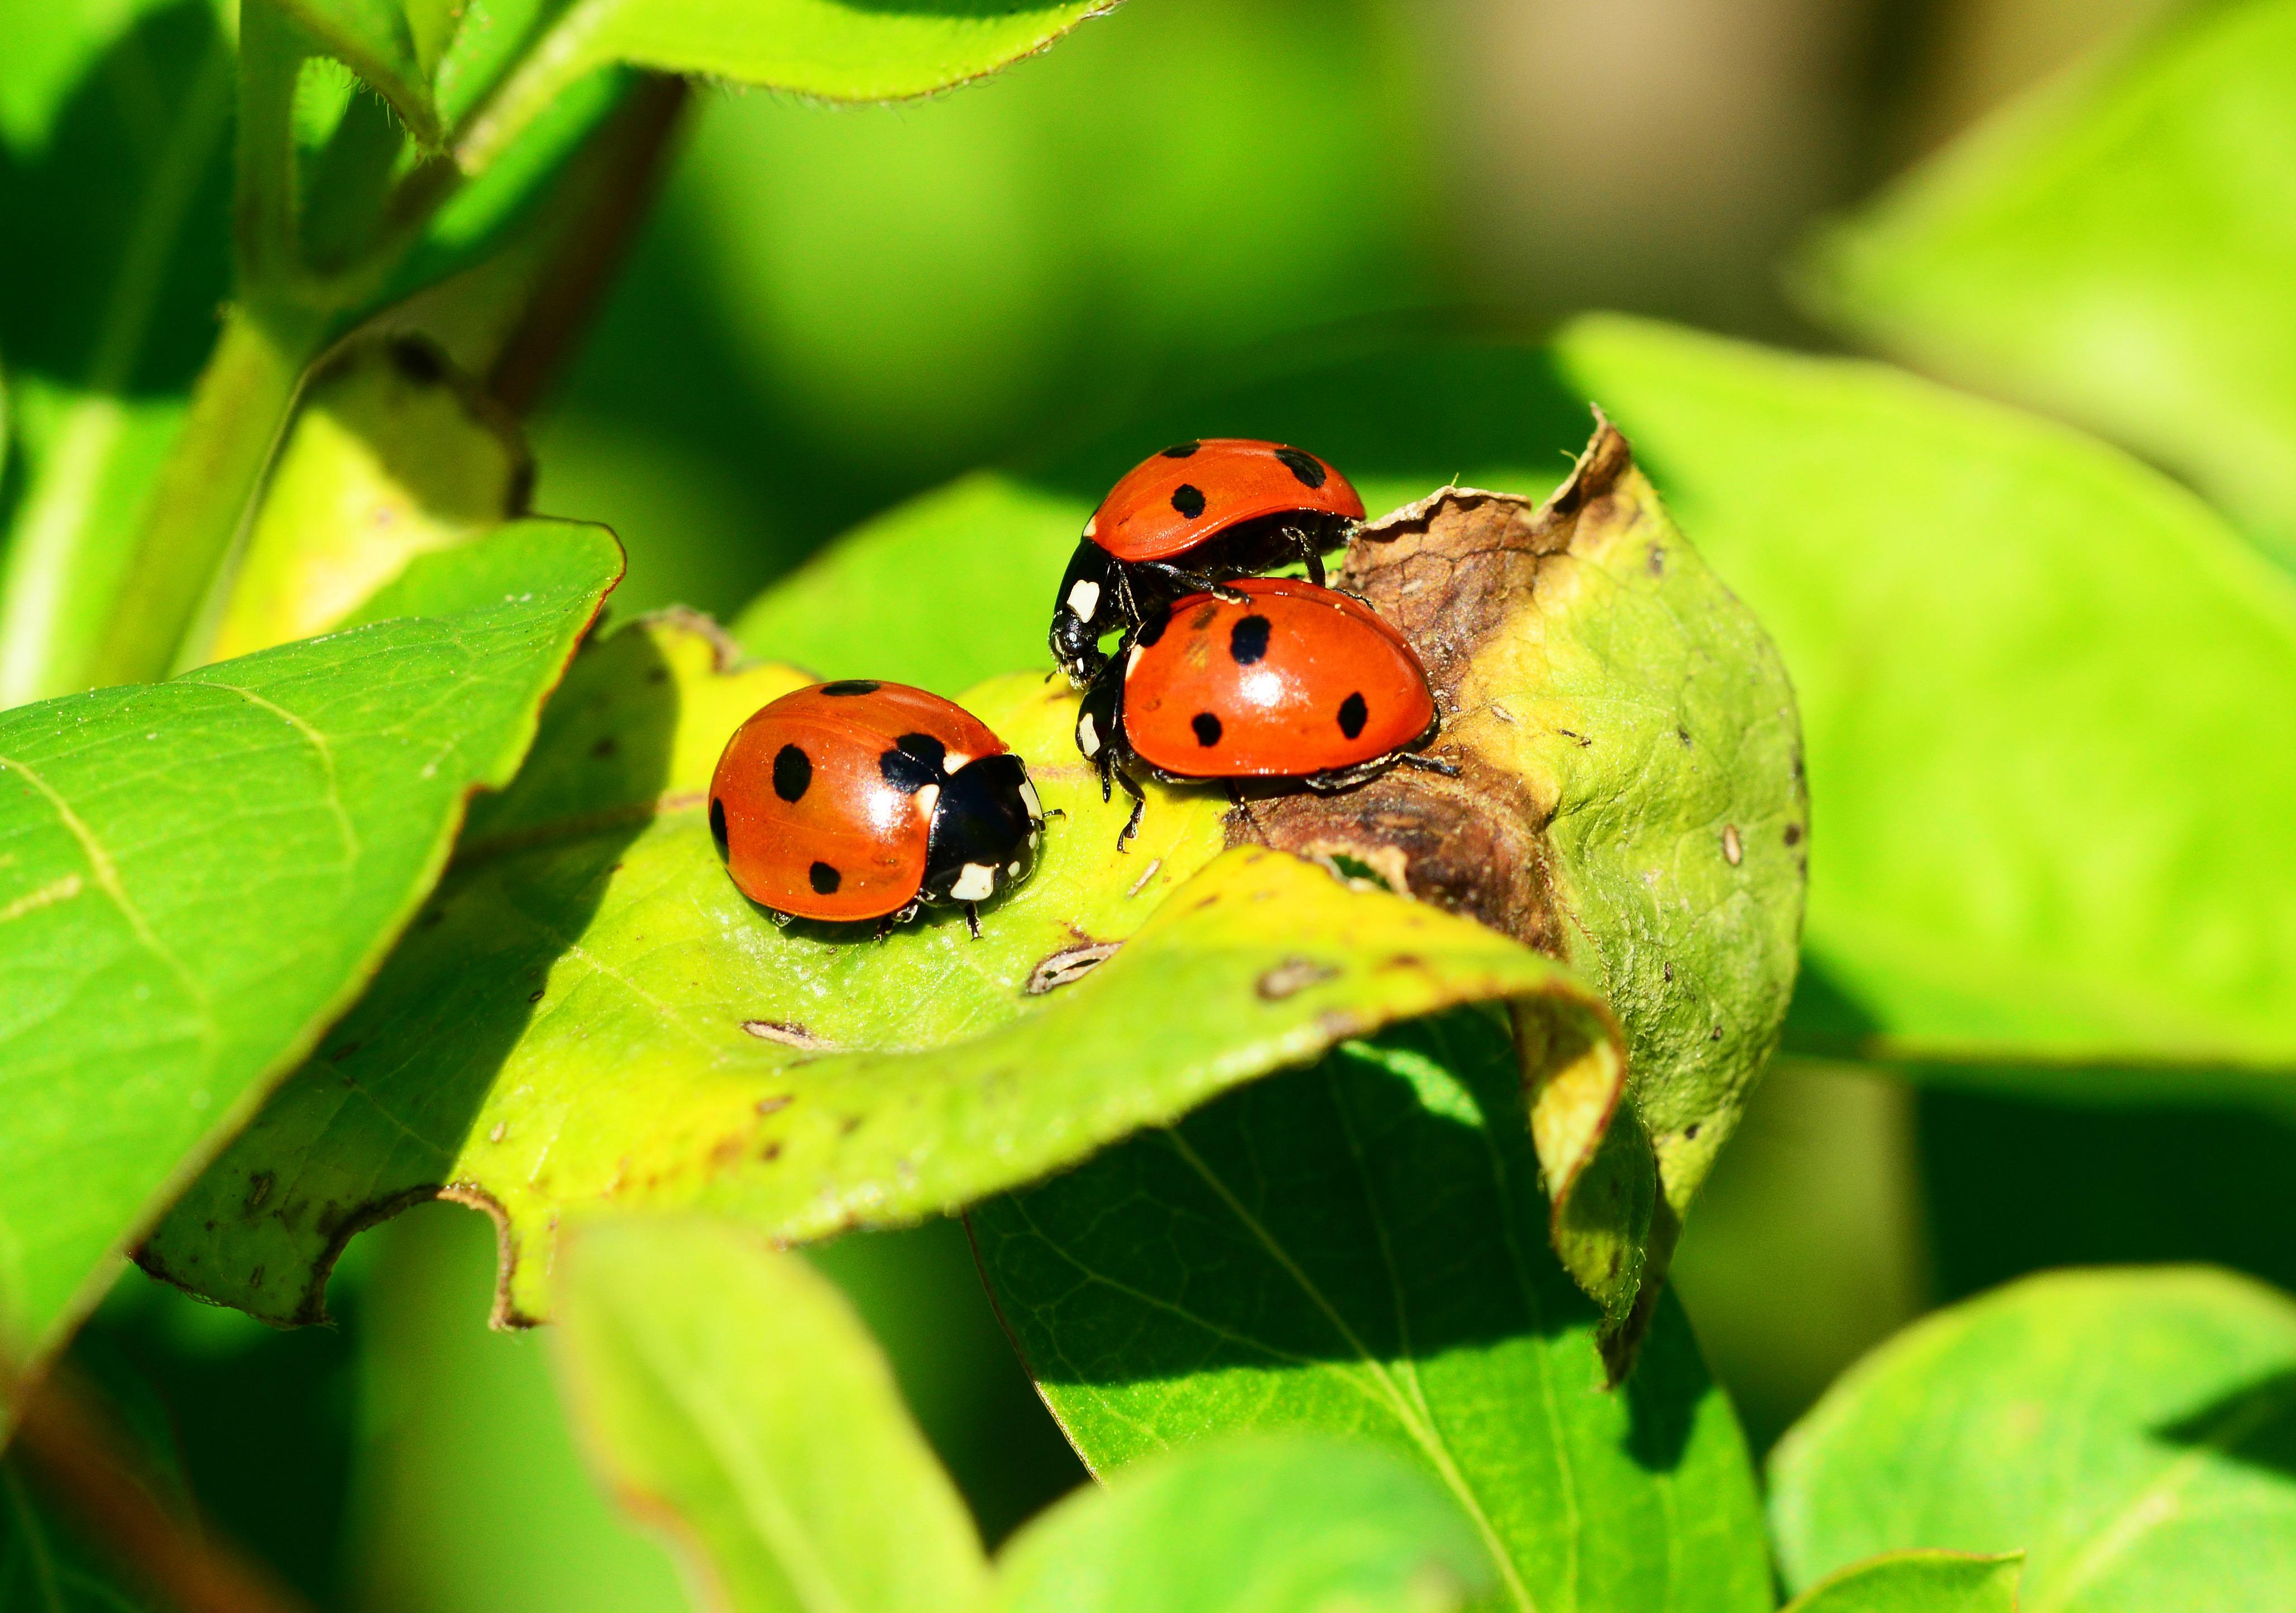 Red Ladybug On Green Leaf Free Stock Photo